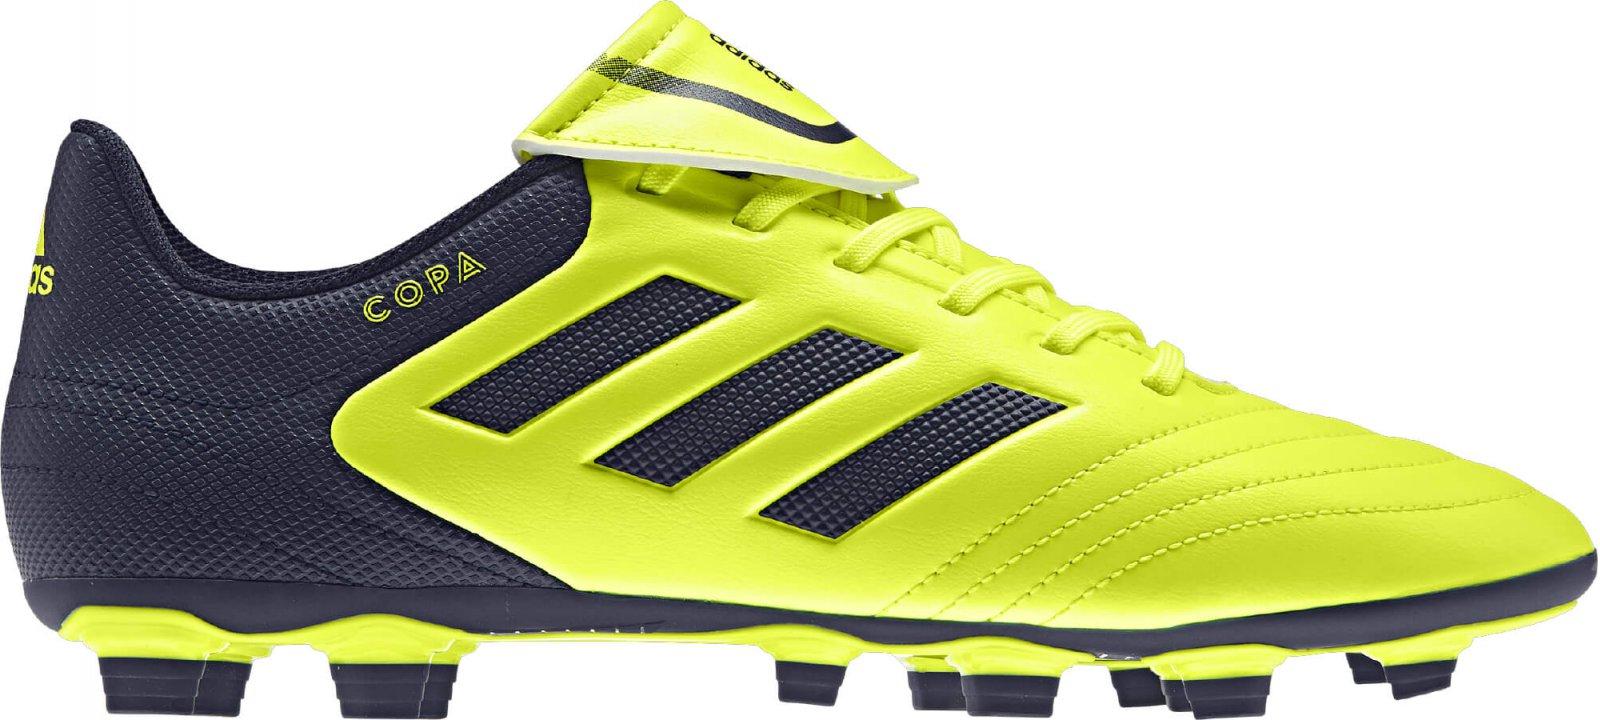 Adidas Copa 17.4 FXG S77162 od 499 Kč • Zboží.cz 0243113077b